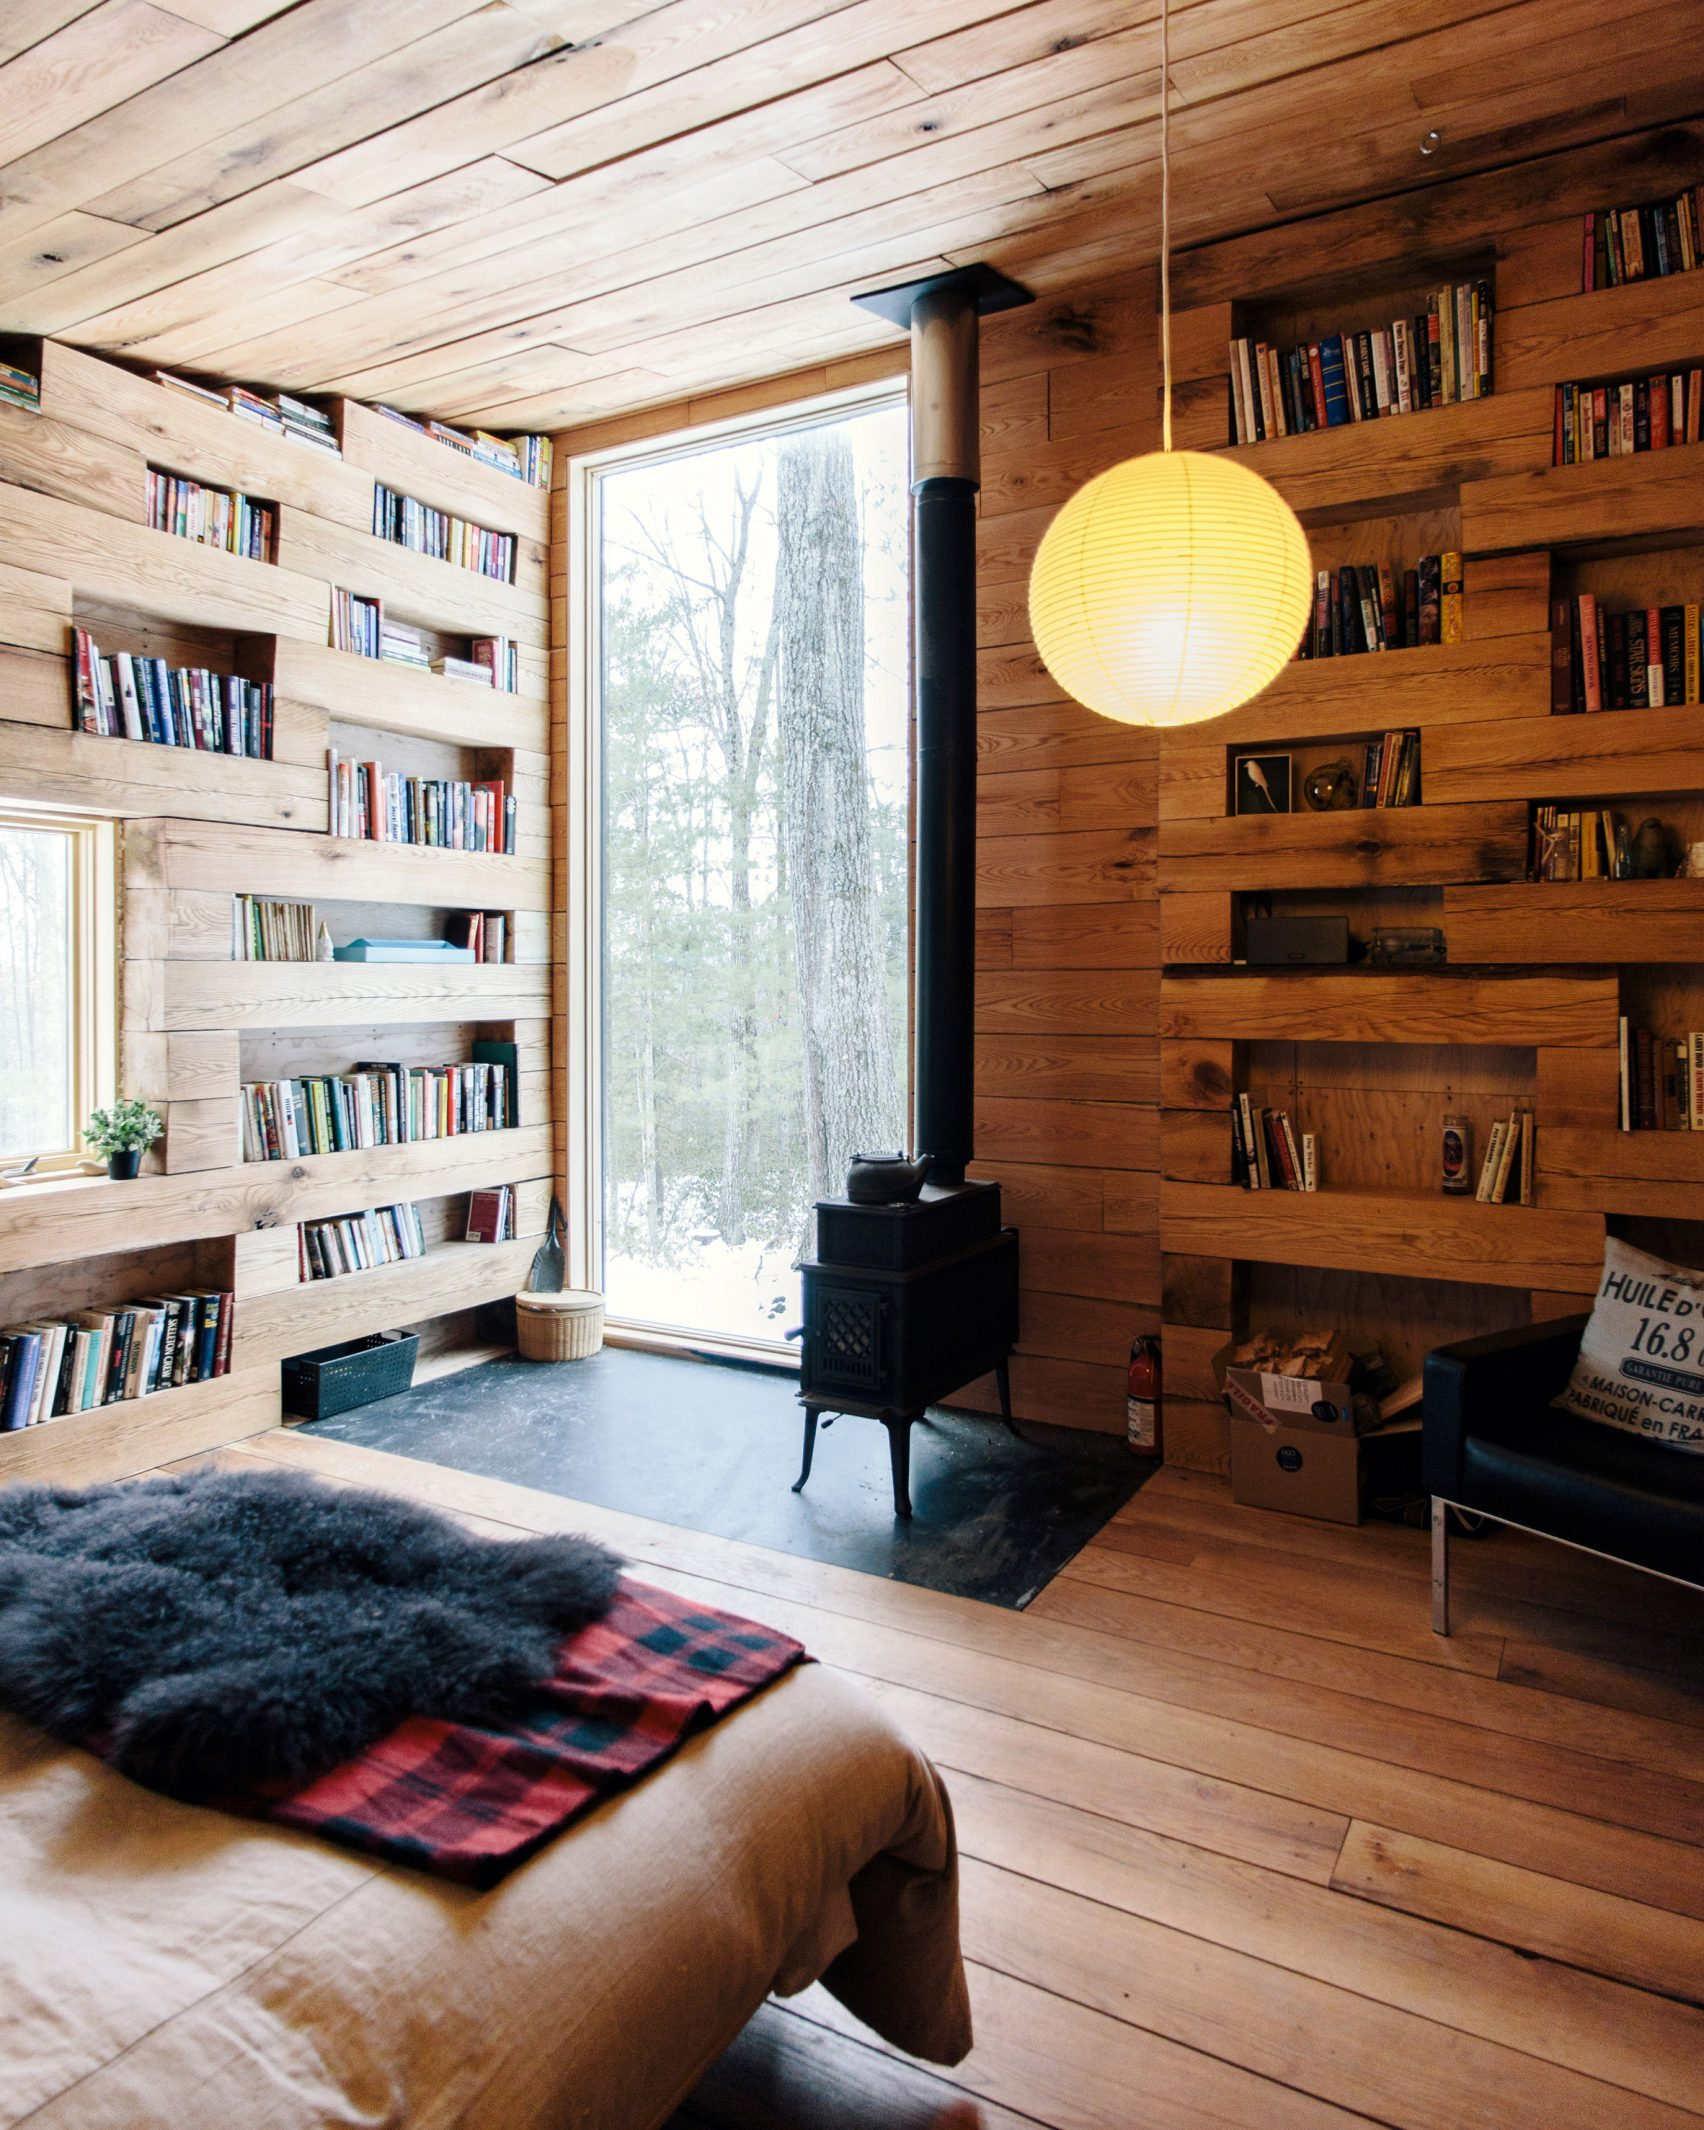 thenordroom-cabin9.jpg